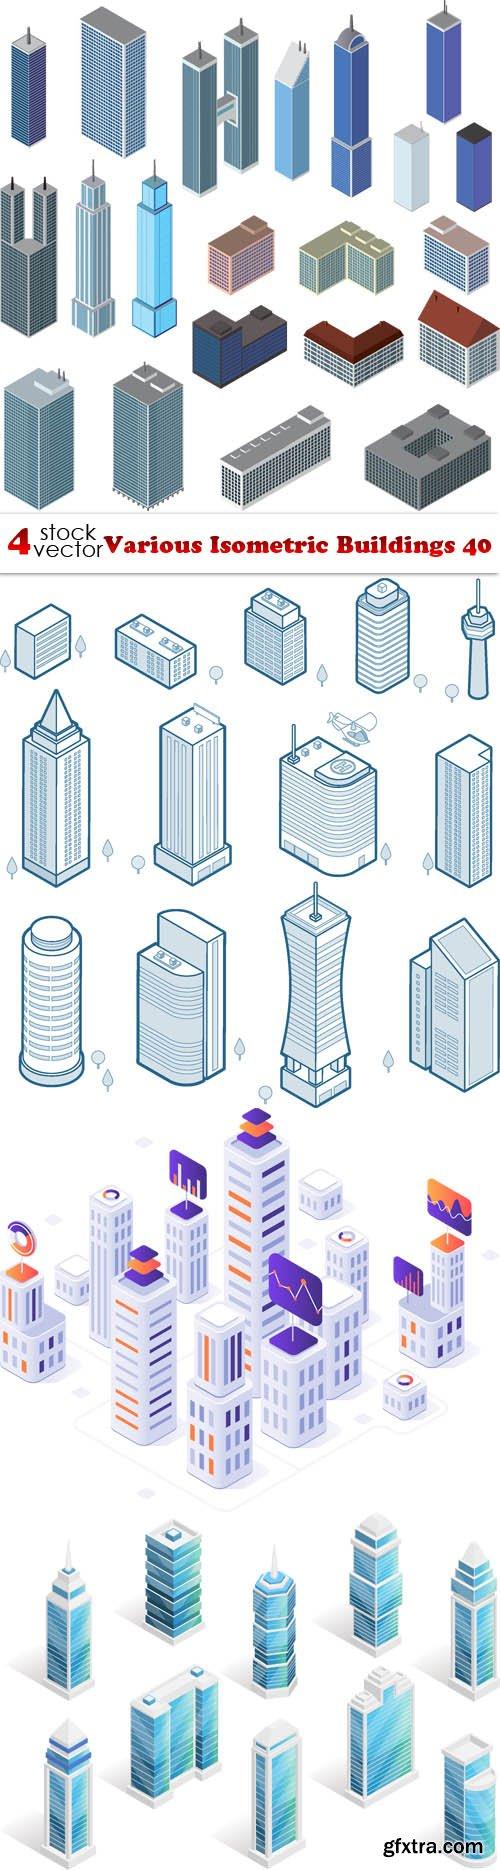 Vectors - Various Isometric Buildings 40